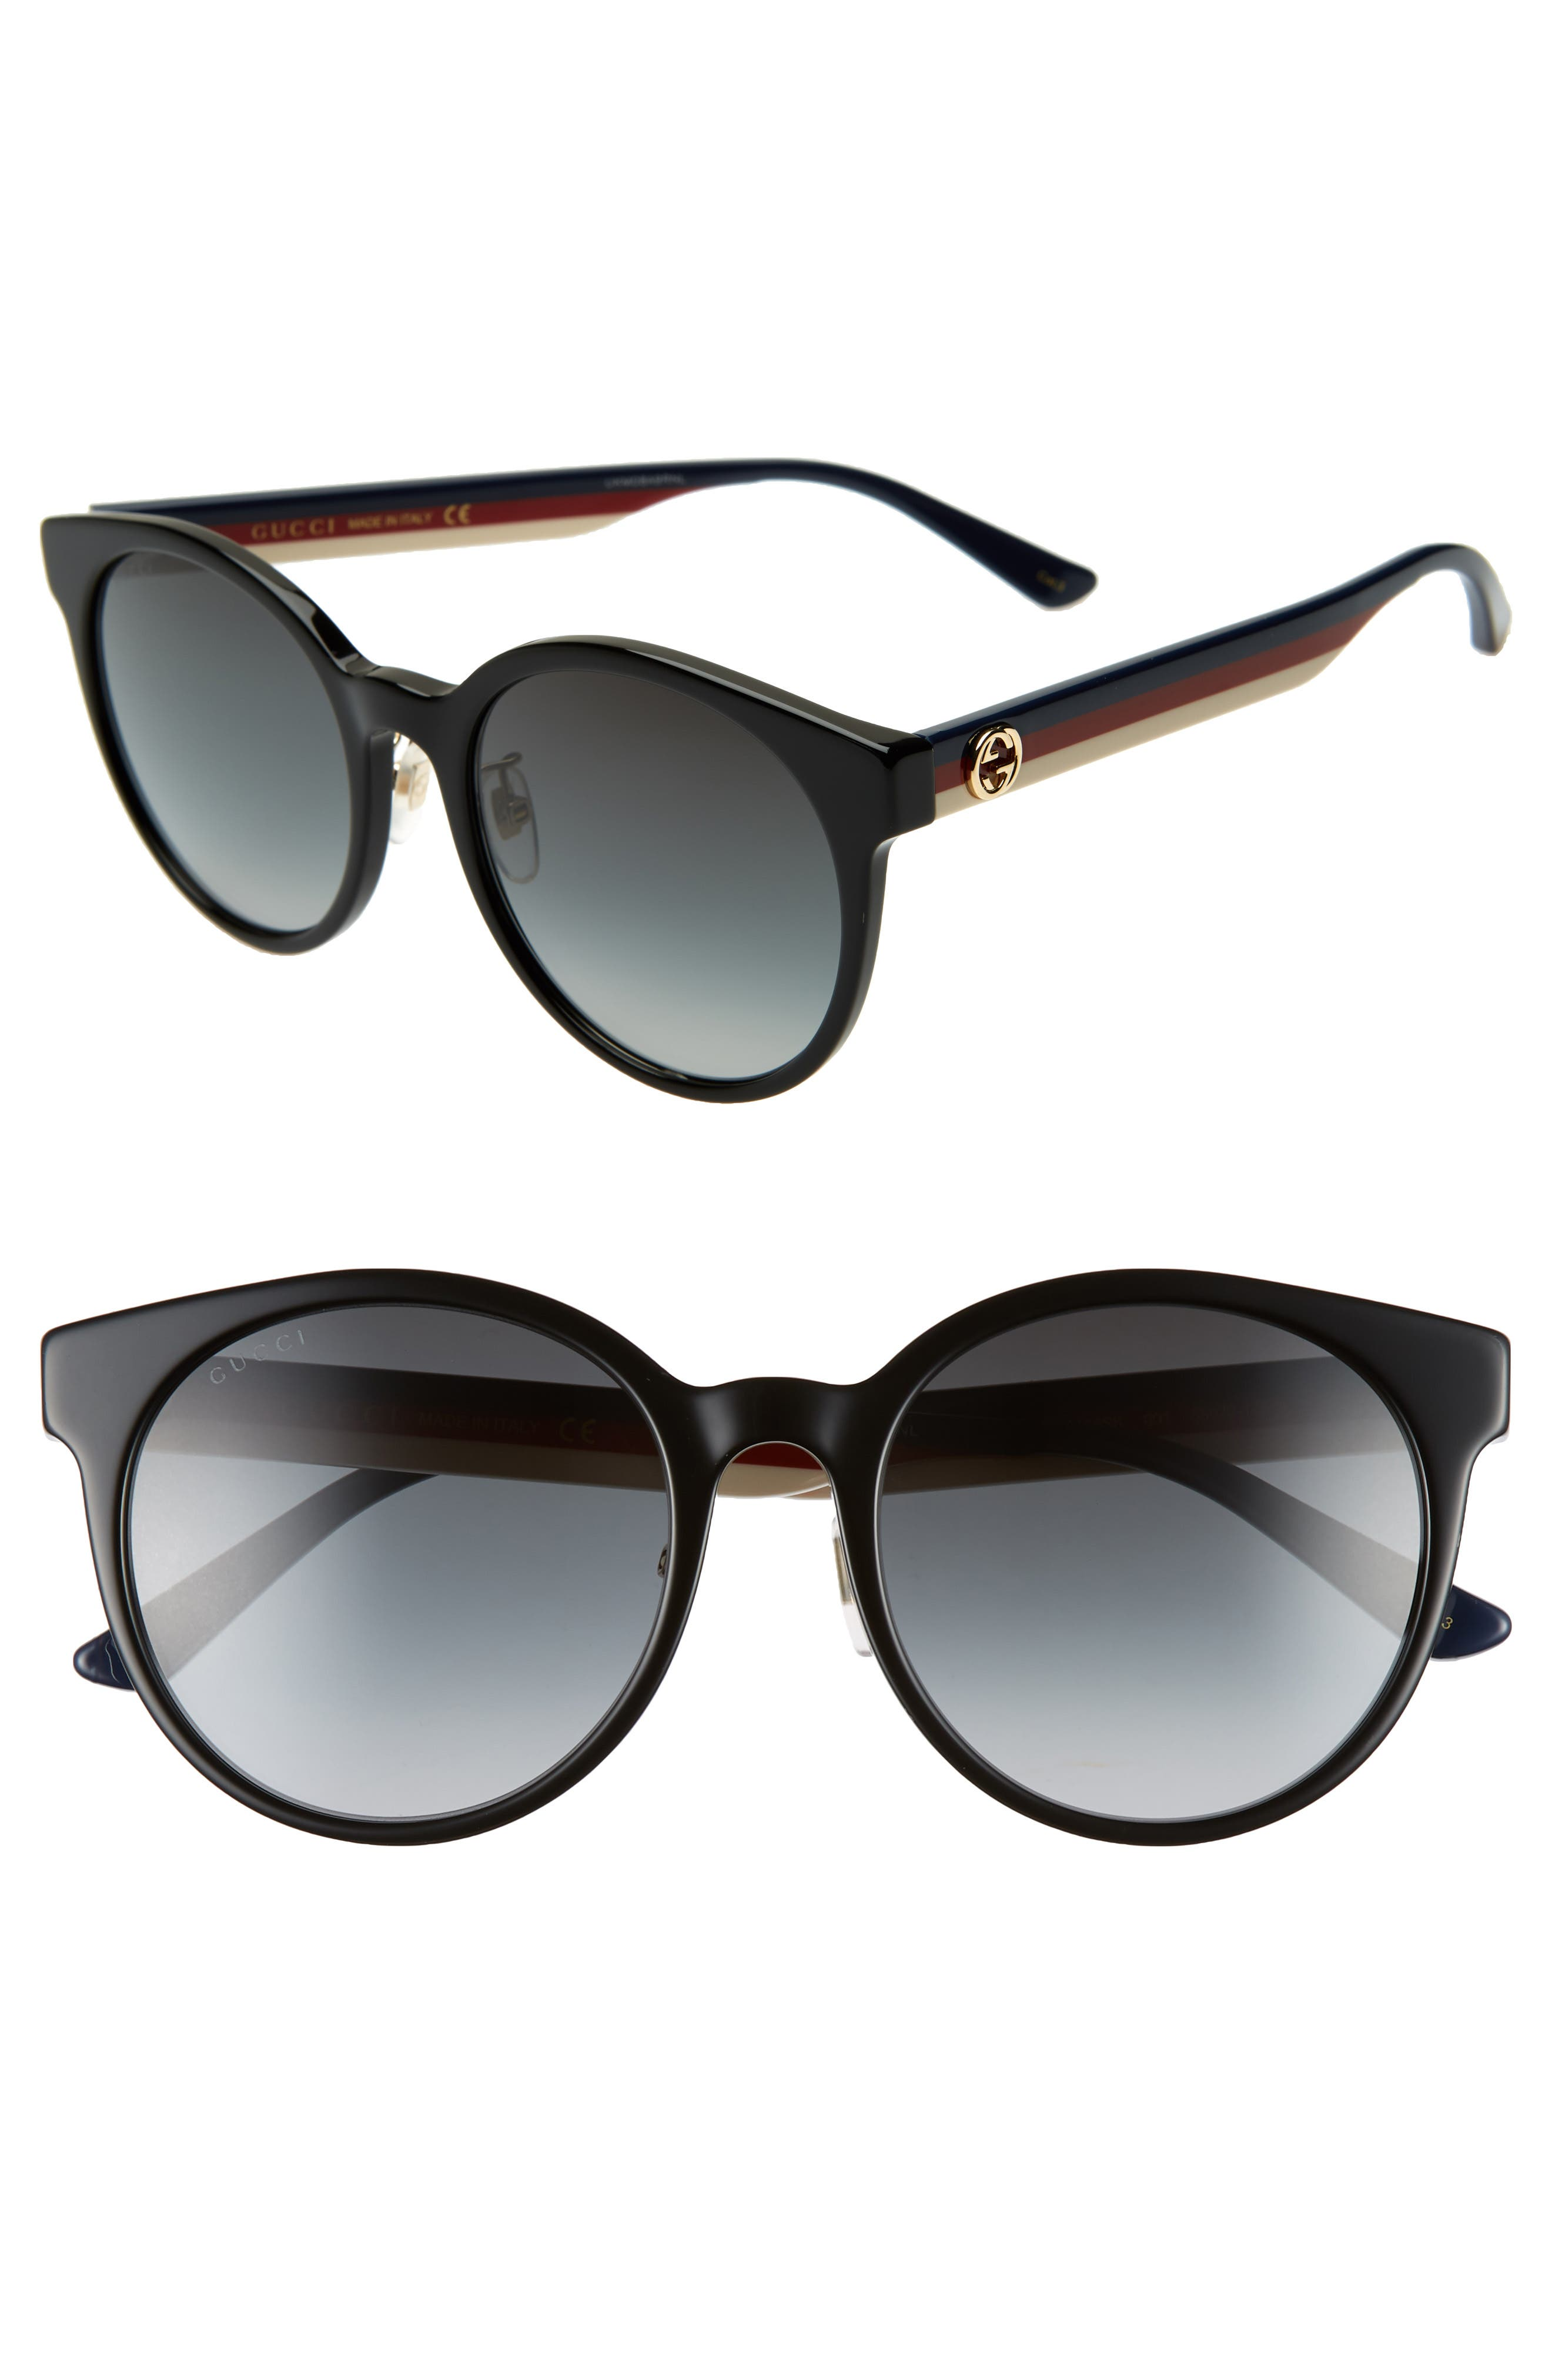 55mm Round Sunglasses, Main, color, BLACK/ MULTI/ GREY GRADIENT